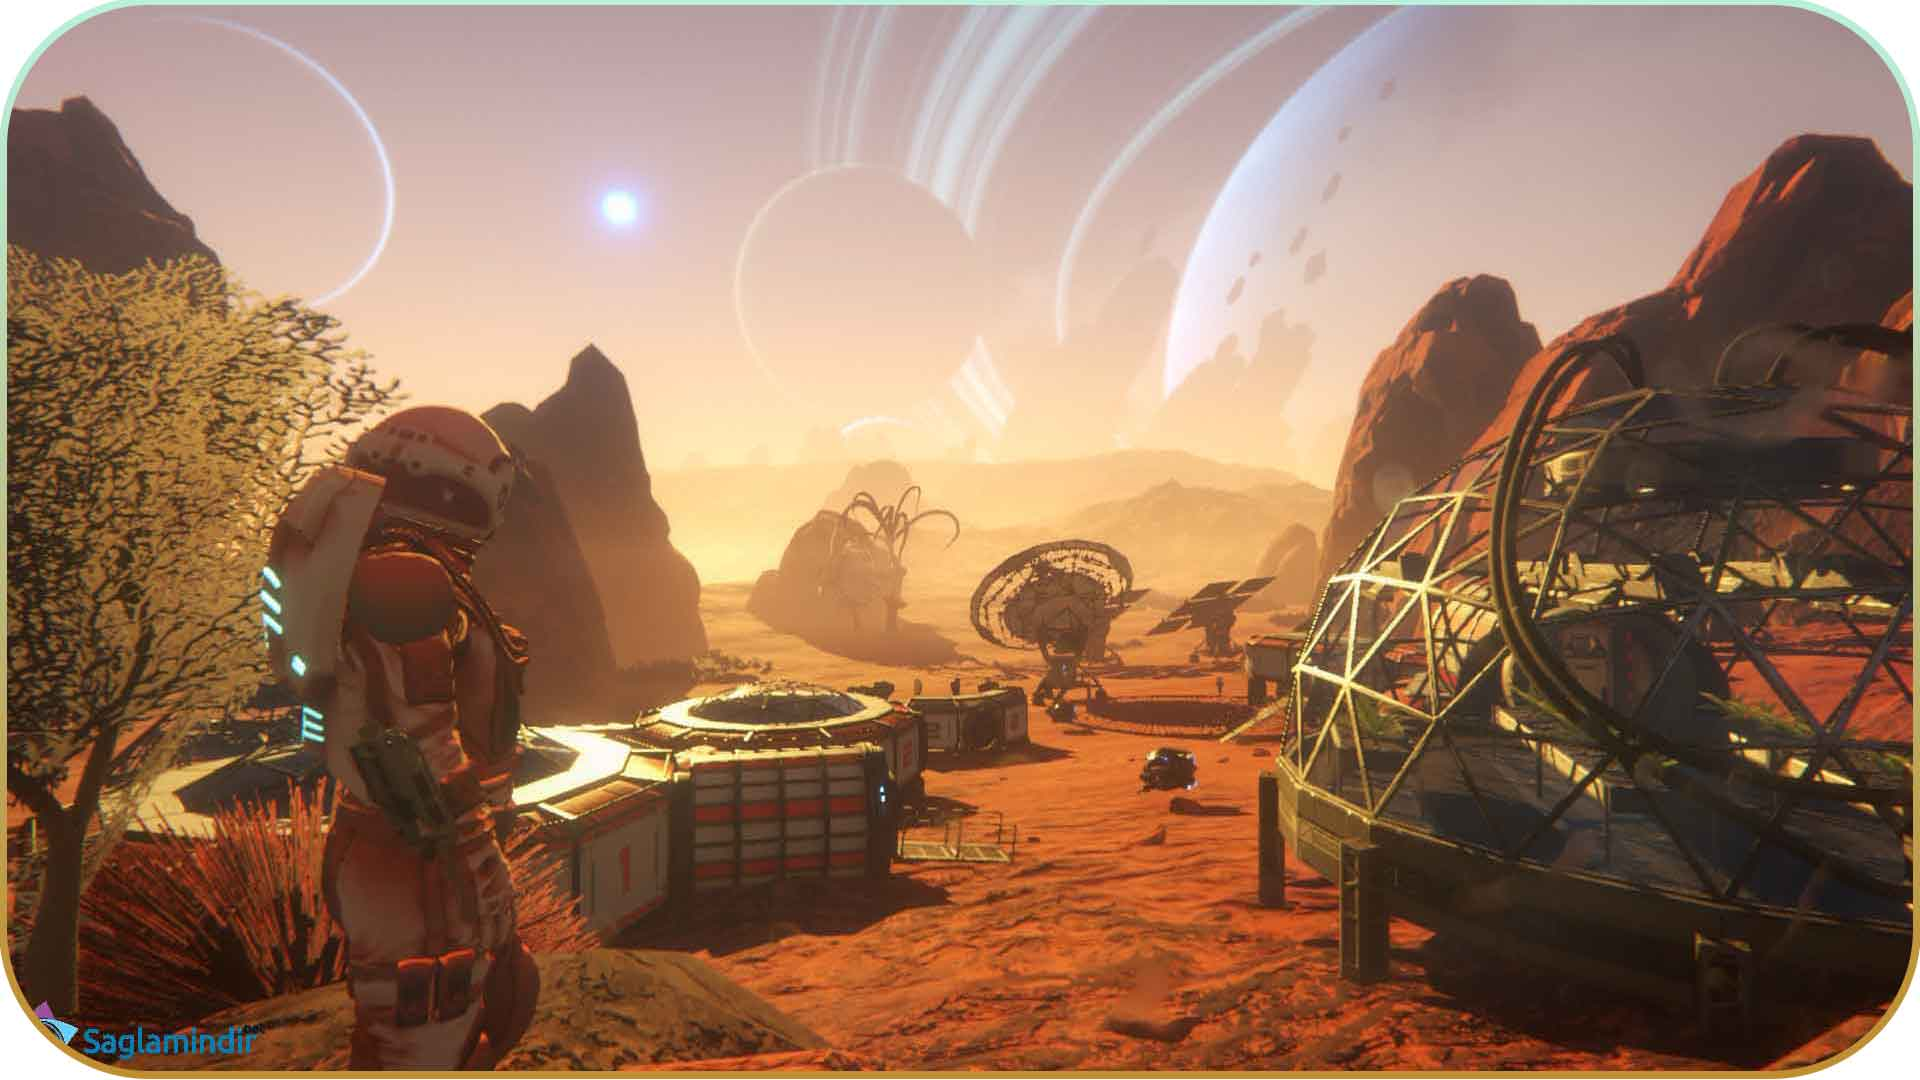 Osiris-New-Dawn-saglamindir